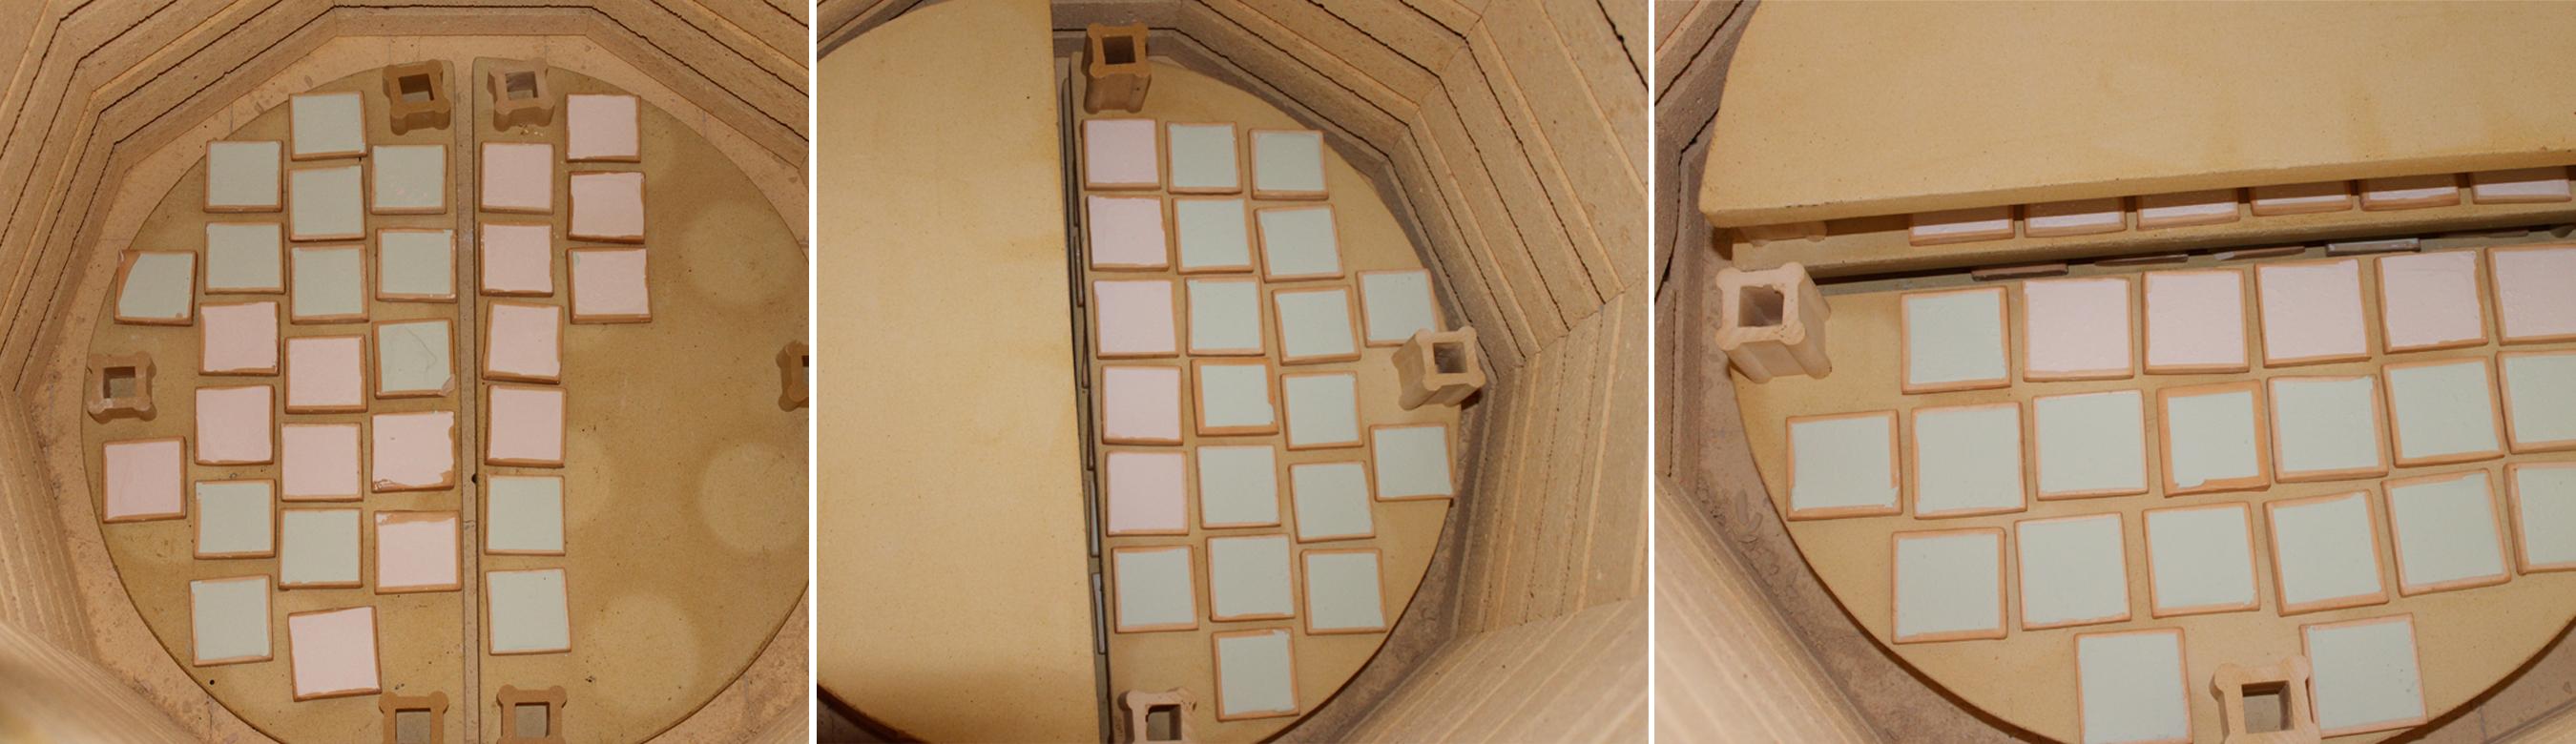 Loading tiles into the kiln